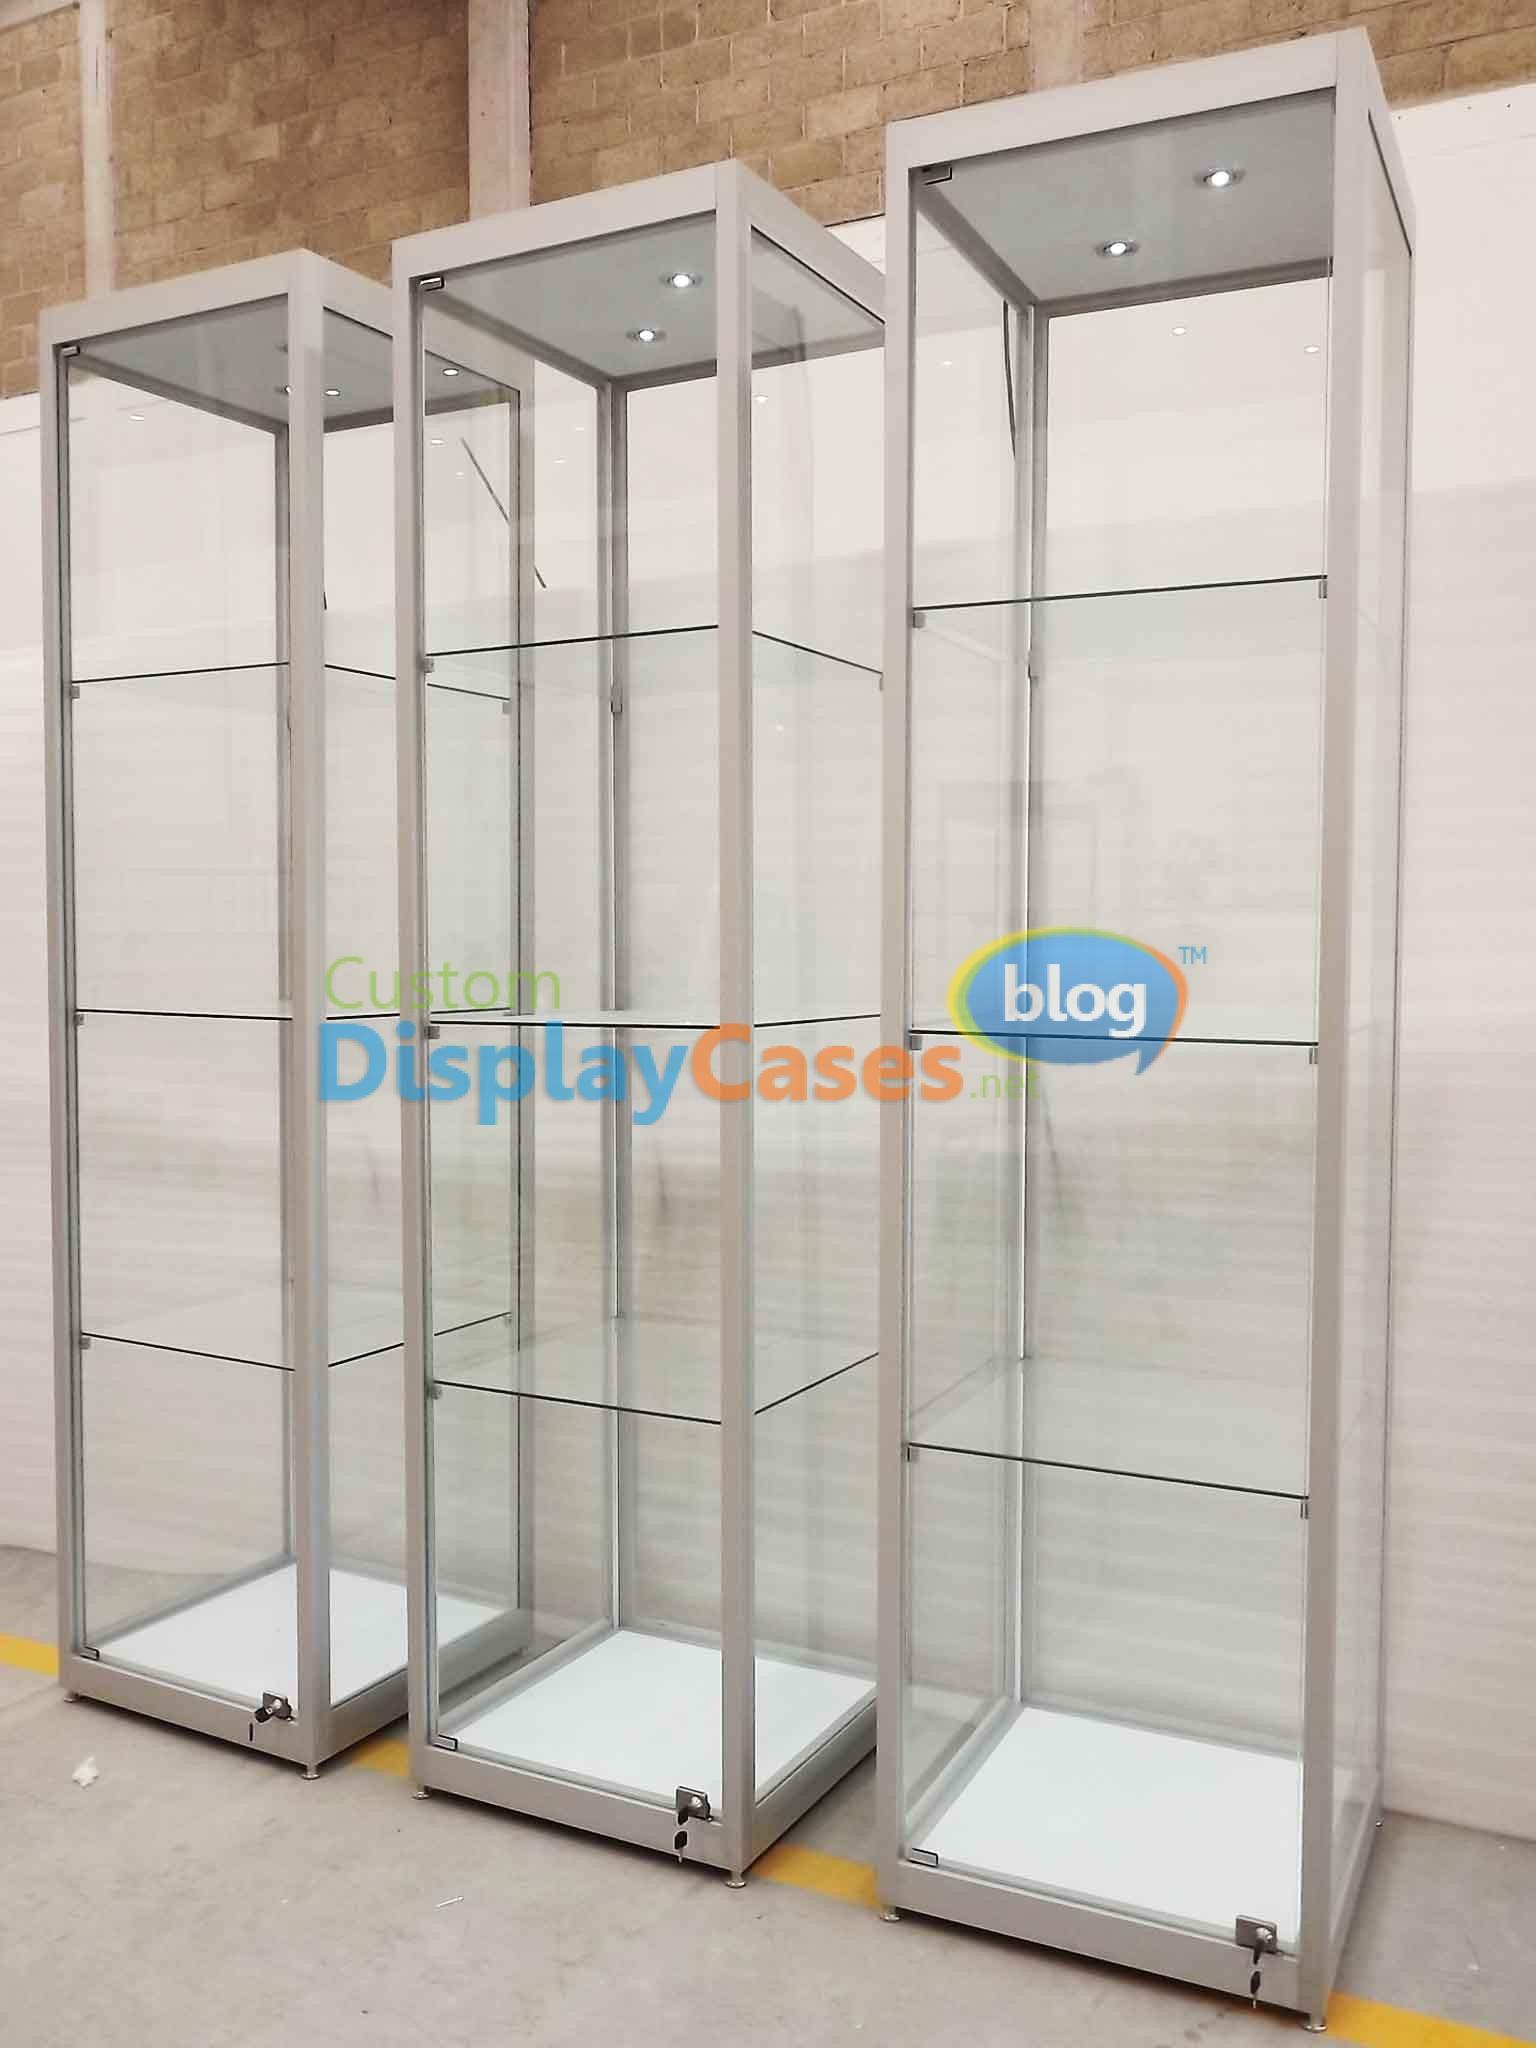 Tower display cases custom made custom display cases blog - Custom display cabinets ...